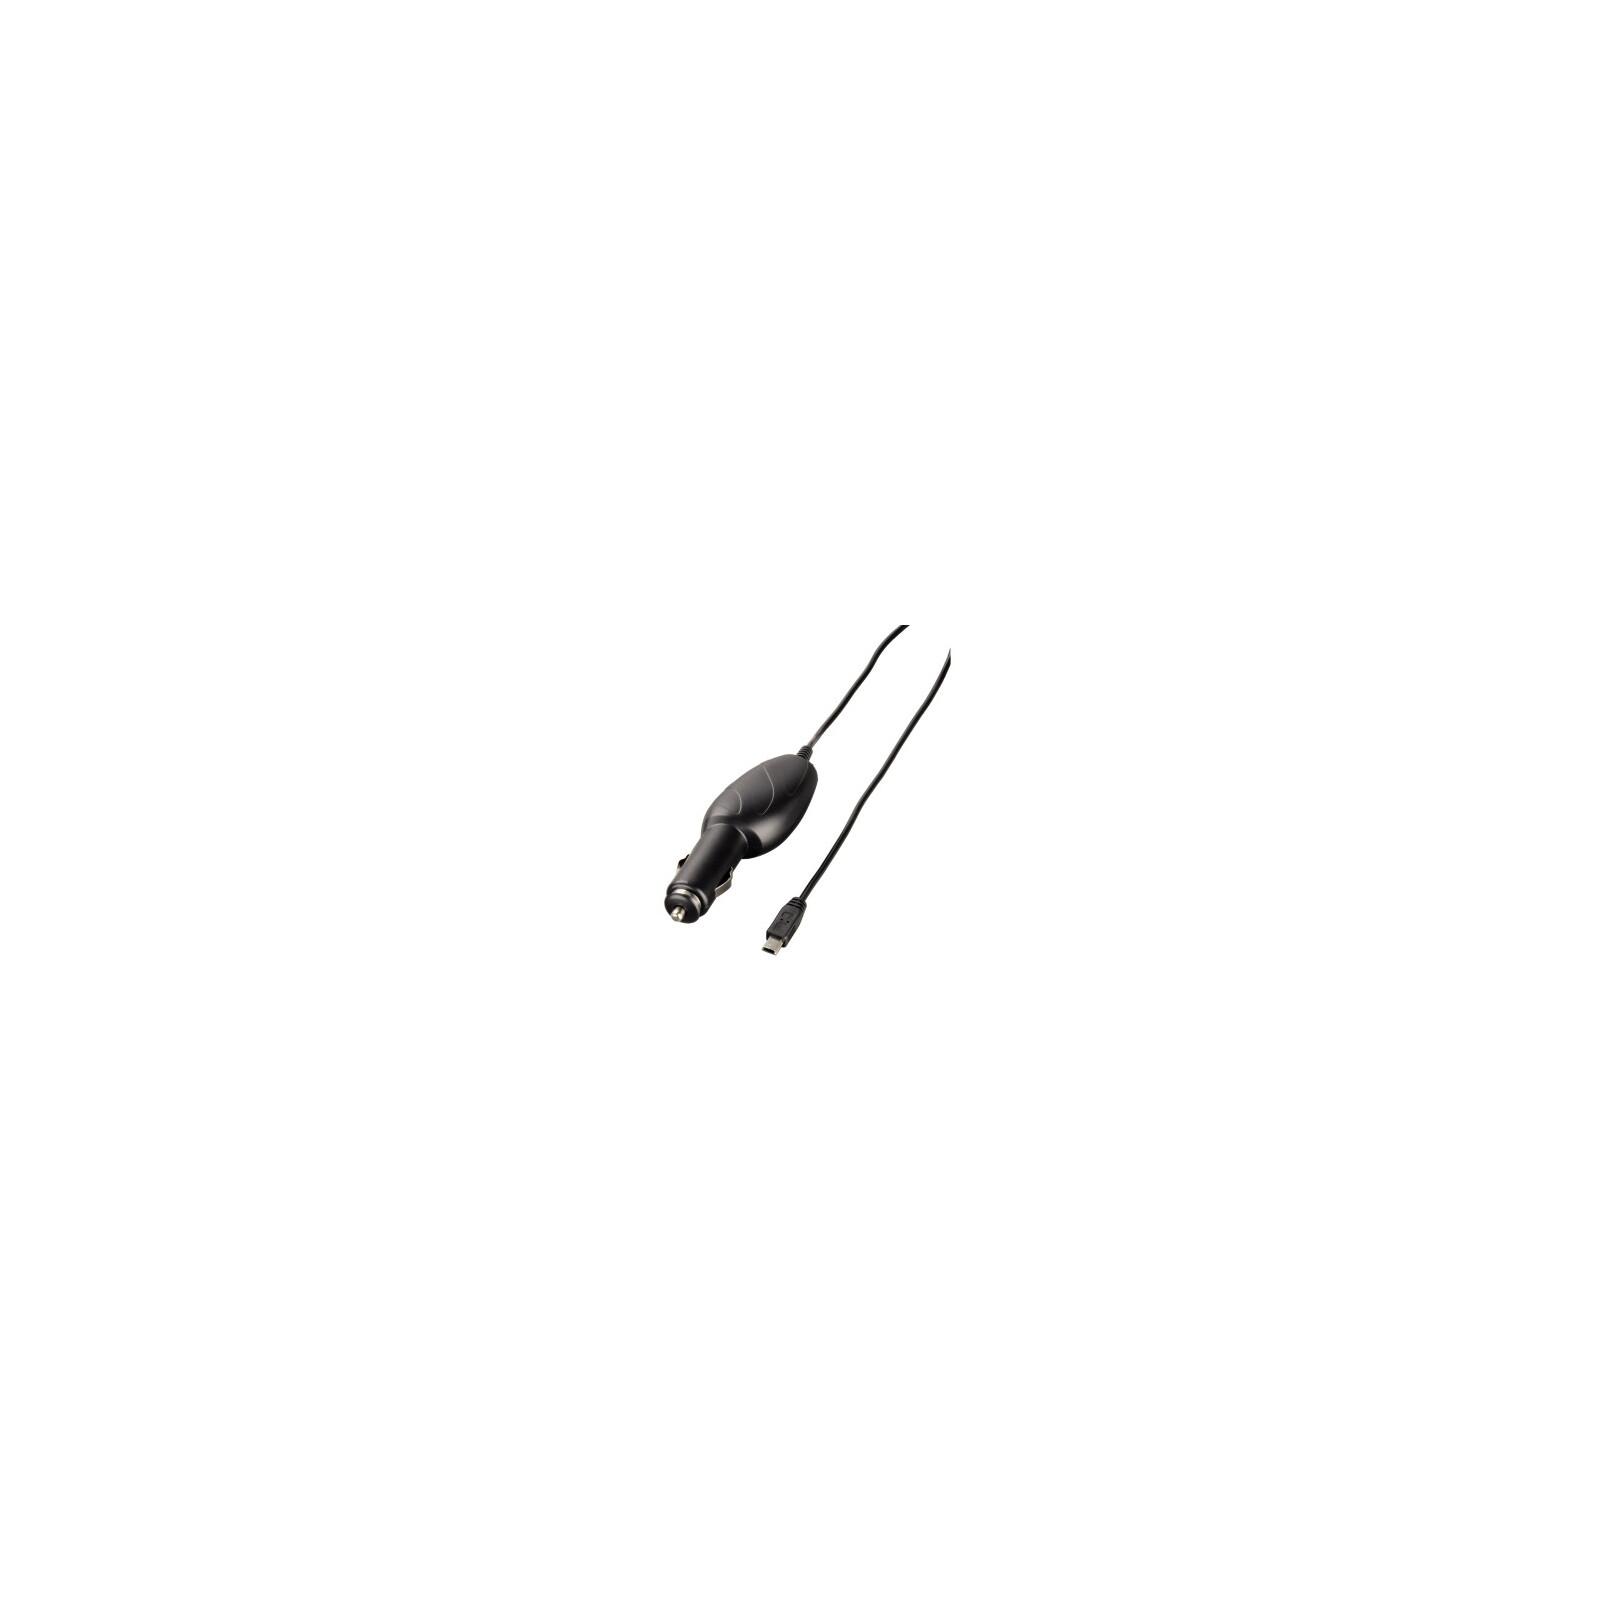 Hama 93731 Kfz-Ladekabel miniUSB 1A